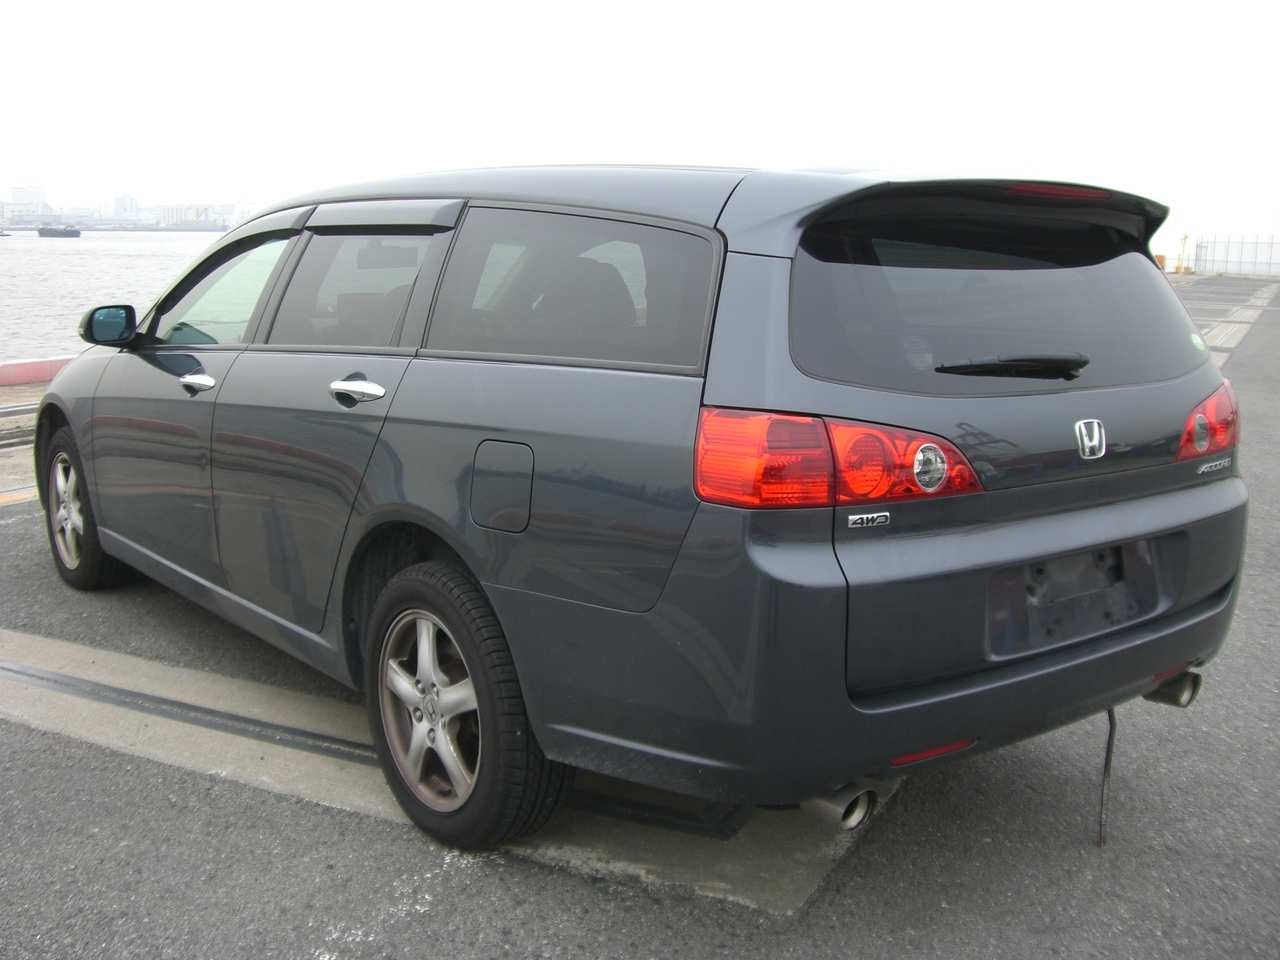 used 2005 honda accord wagon photos 2400cc gasoline automatic for sale. Black Bedroom Furniture Sets. Home Design Ideas